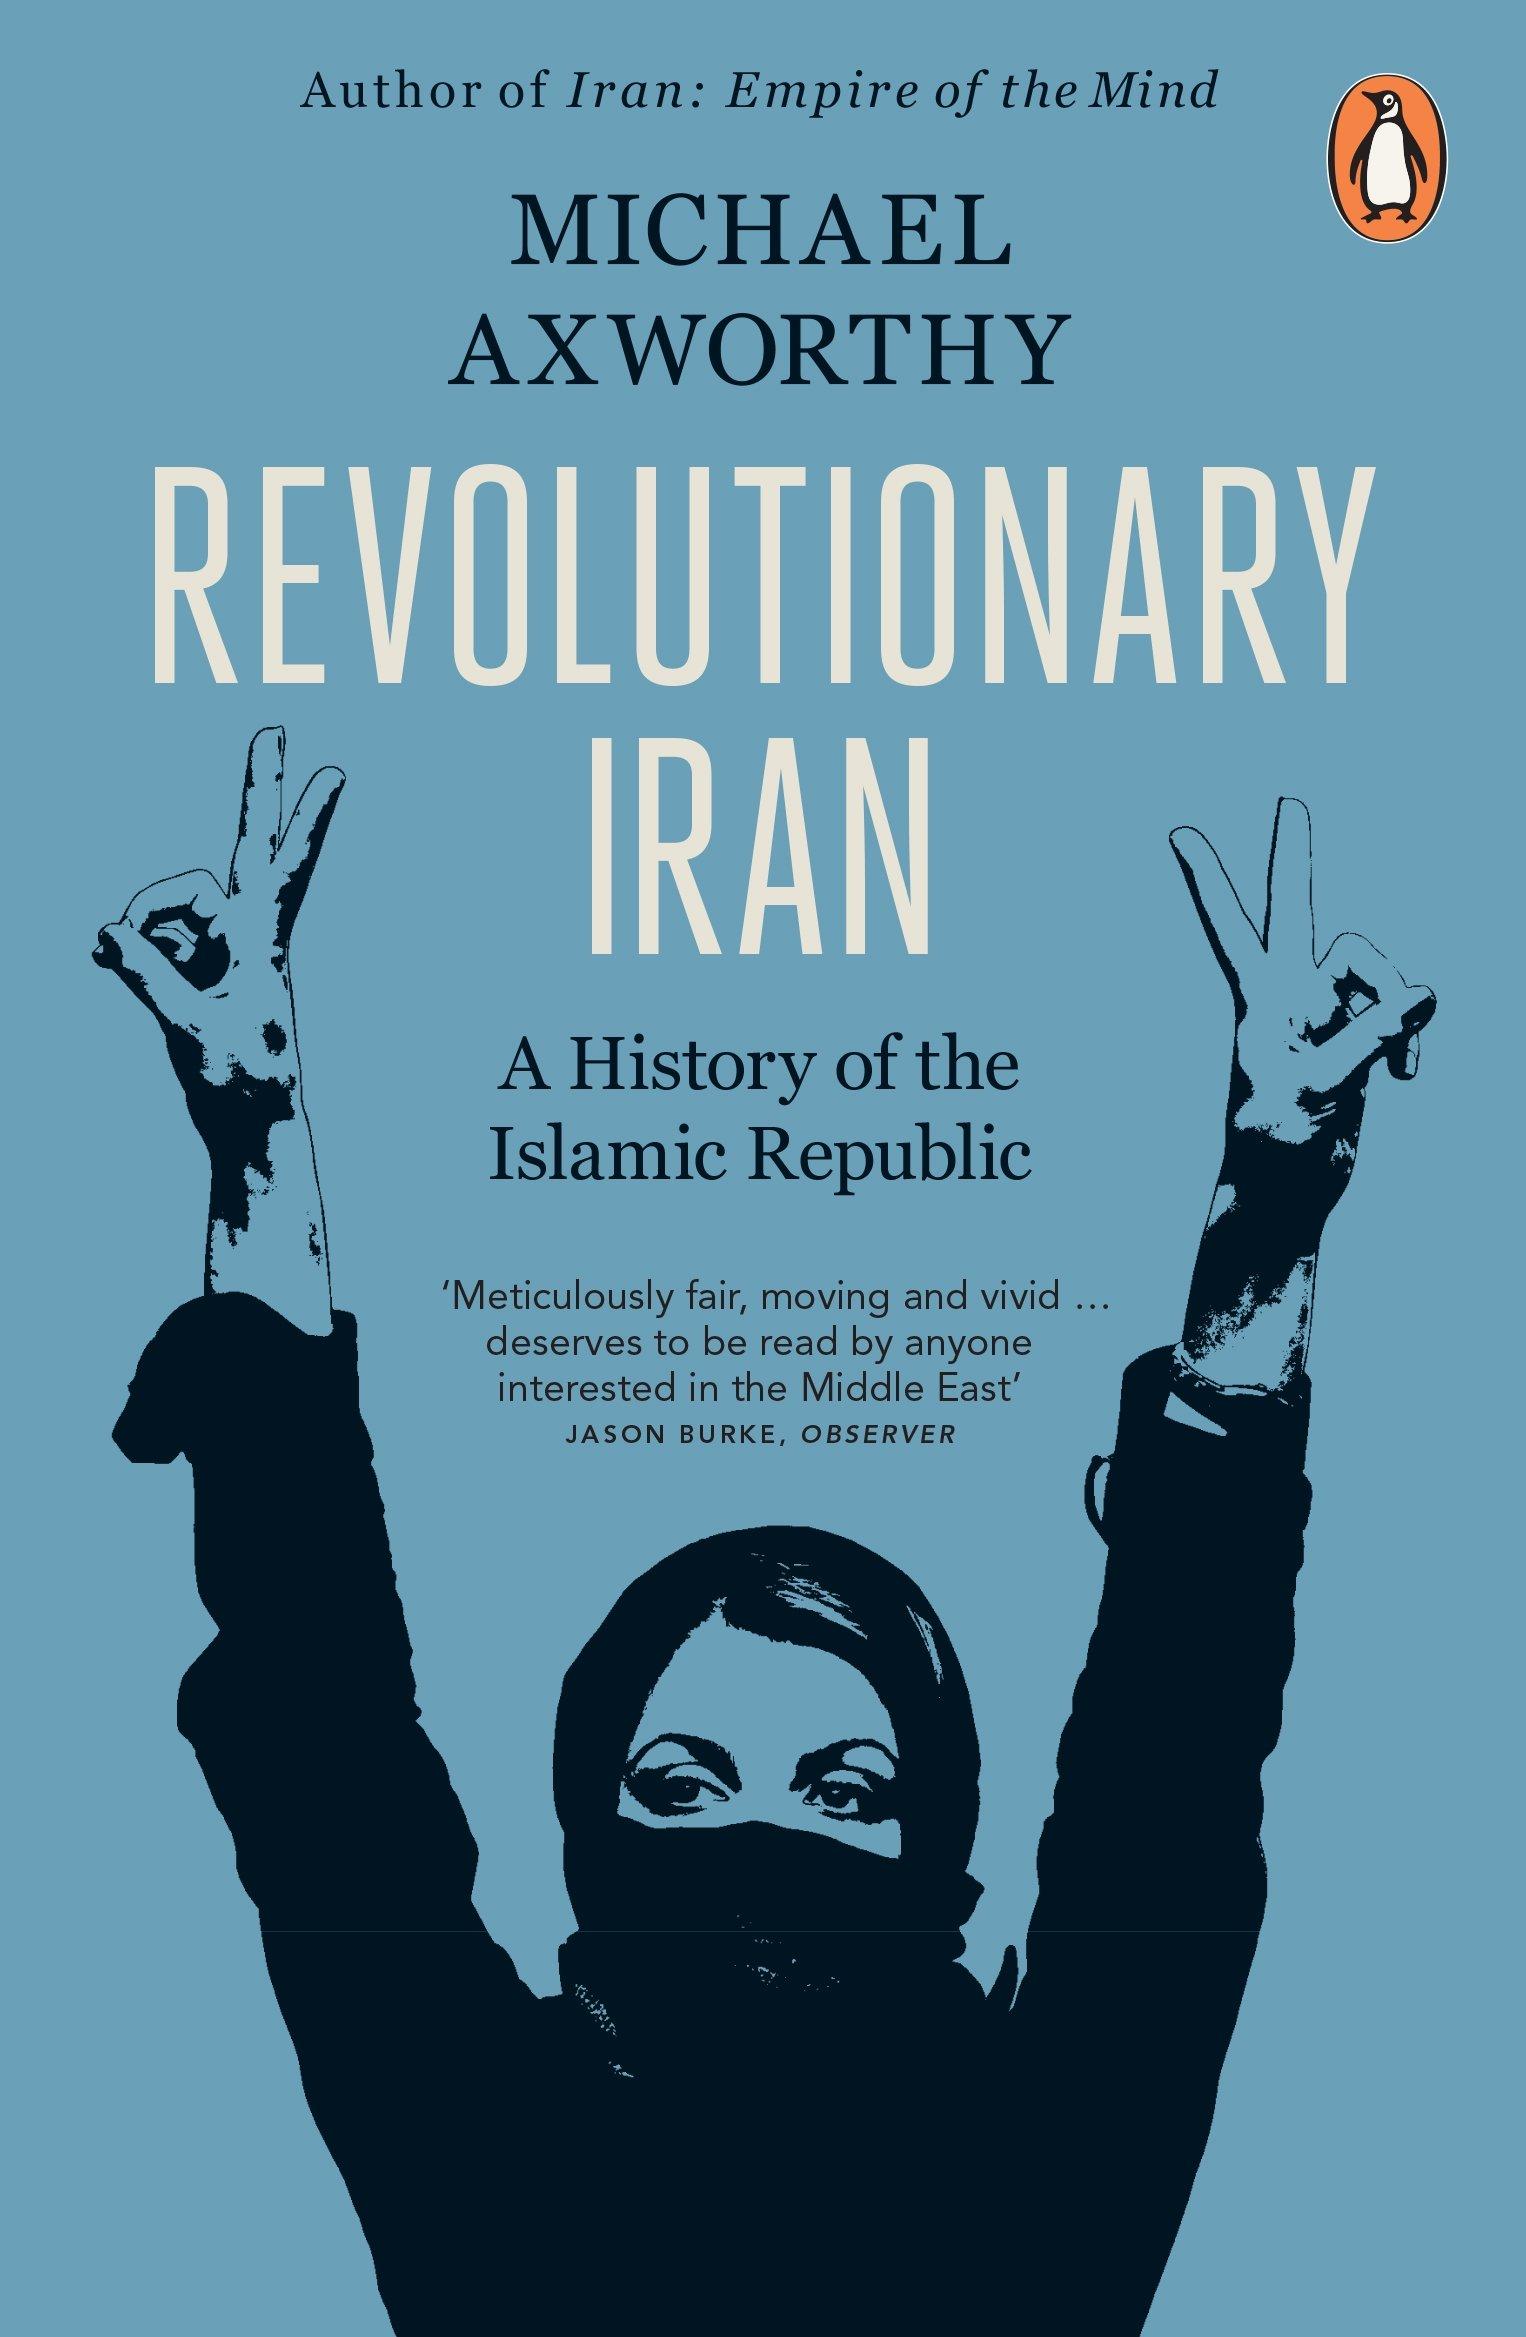 Revolutionary Iran: A History of the Islamic Republic: Amazon.co.uk:  Michael Axworthy: 9780141046235: Books